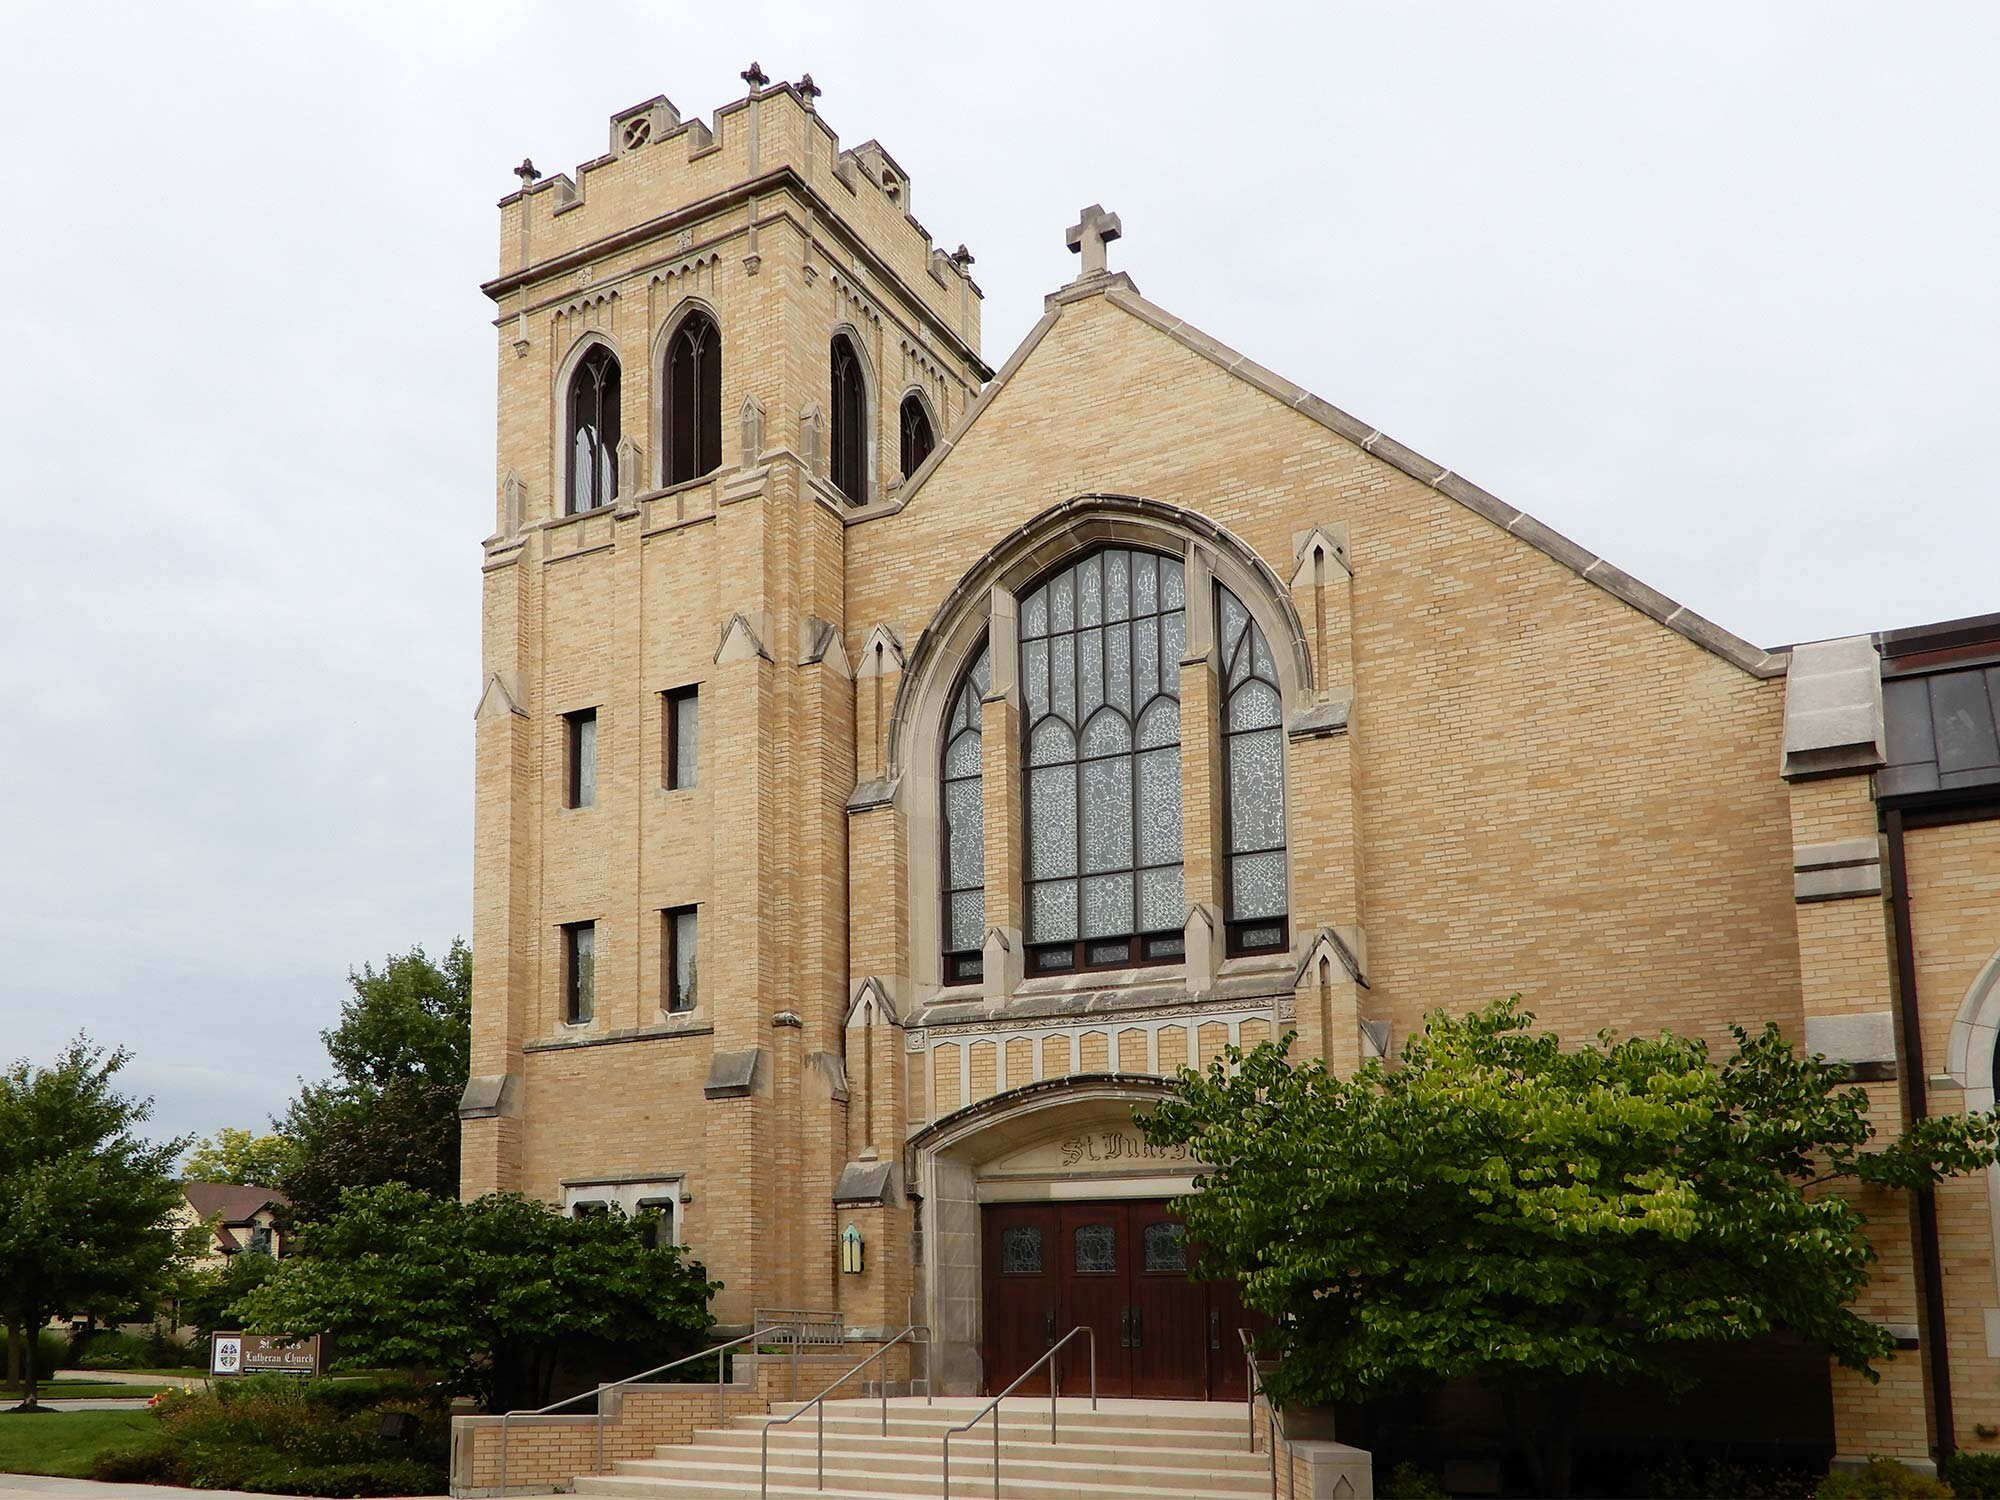 St. Luke's Lutheran Church, Park Ridge, IL, designed by Elisabeth A. Martini. Photo by Julia Bachrach.